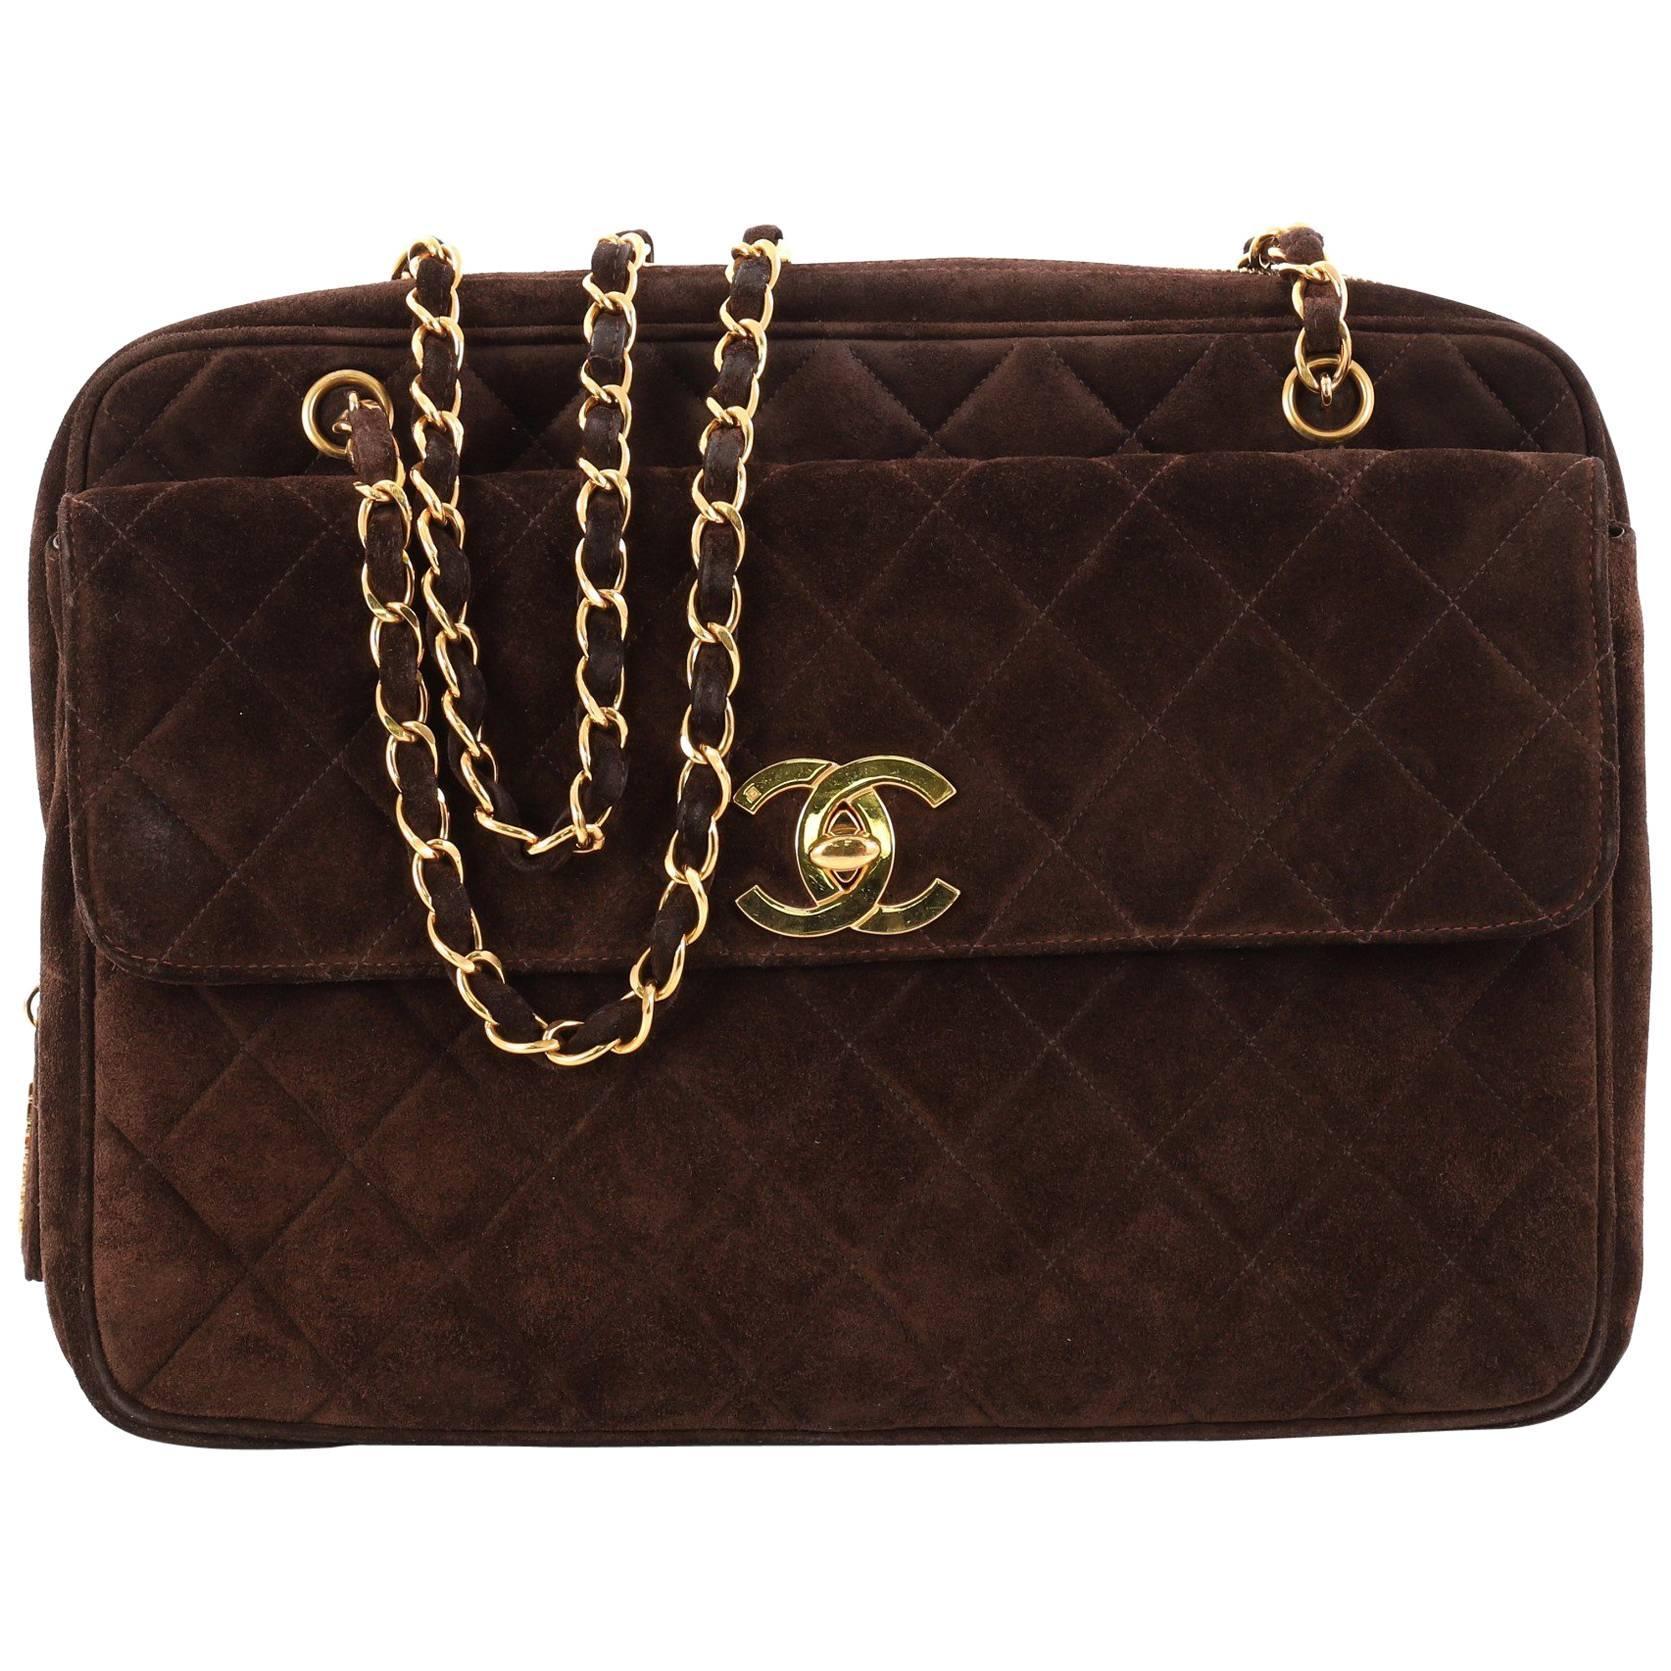 7a288ef3d274 Chanel Vintage Front Pocket Camera Bag Quilted Suede Maxi at 1stdibs